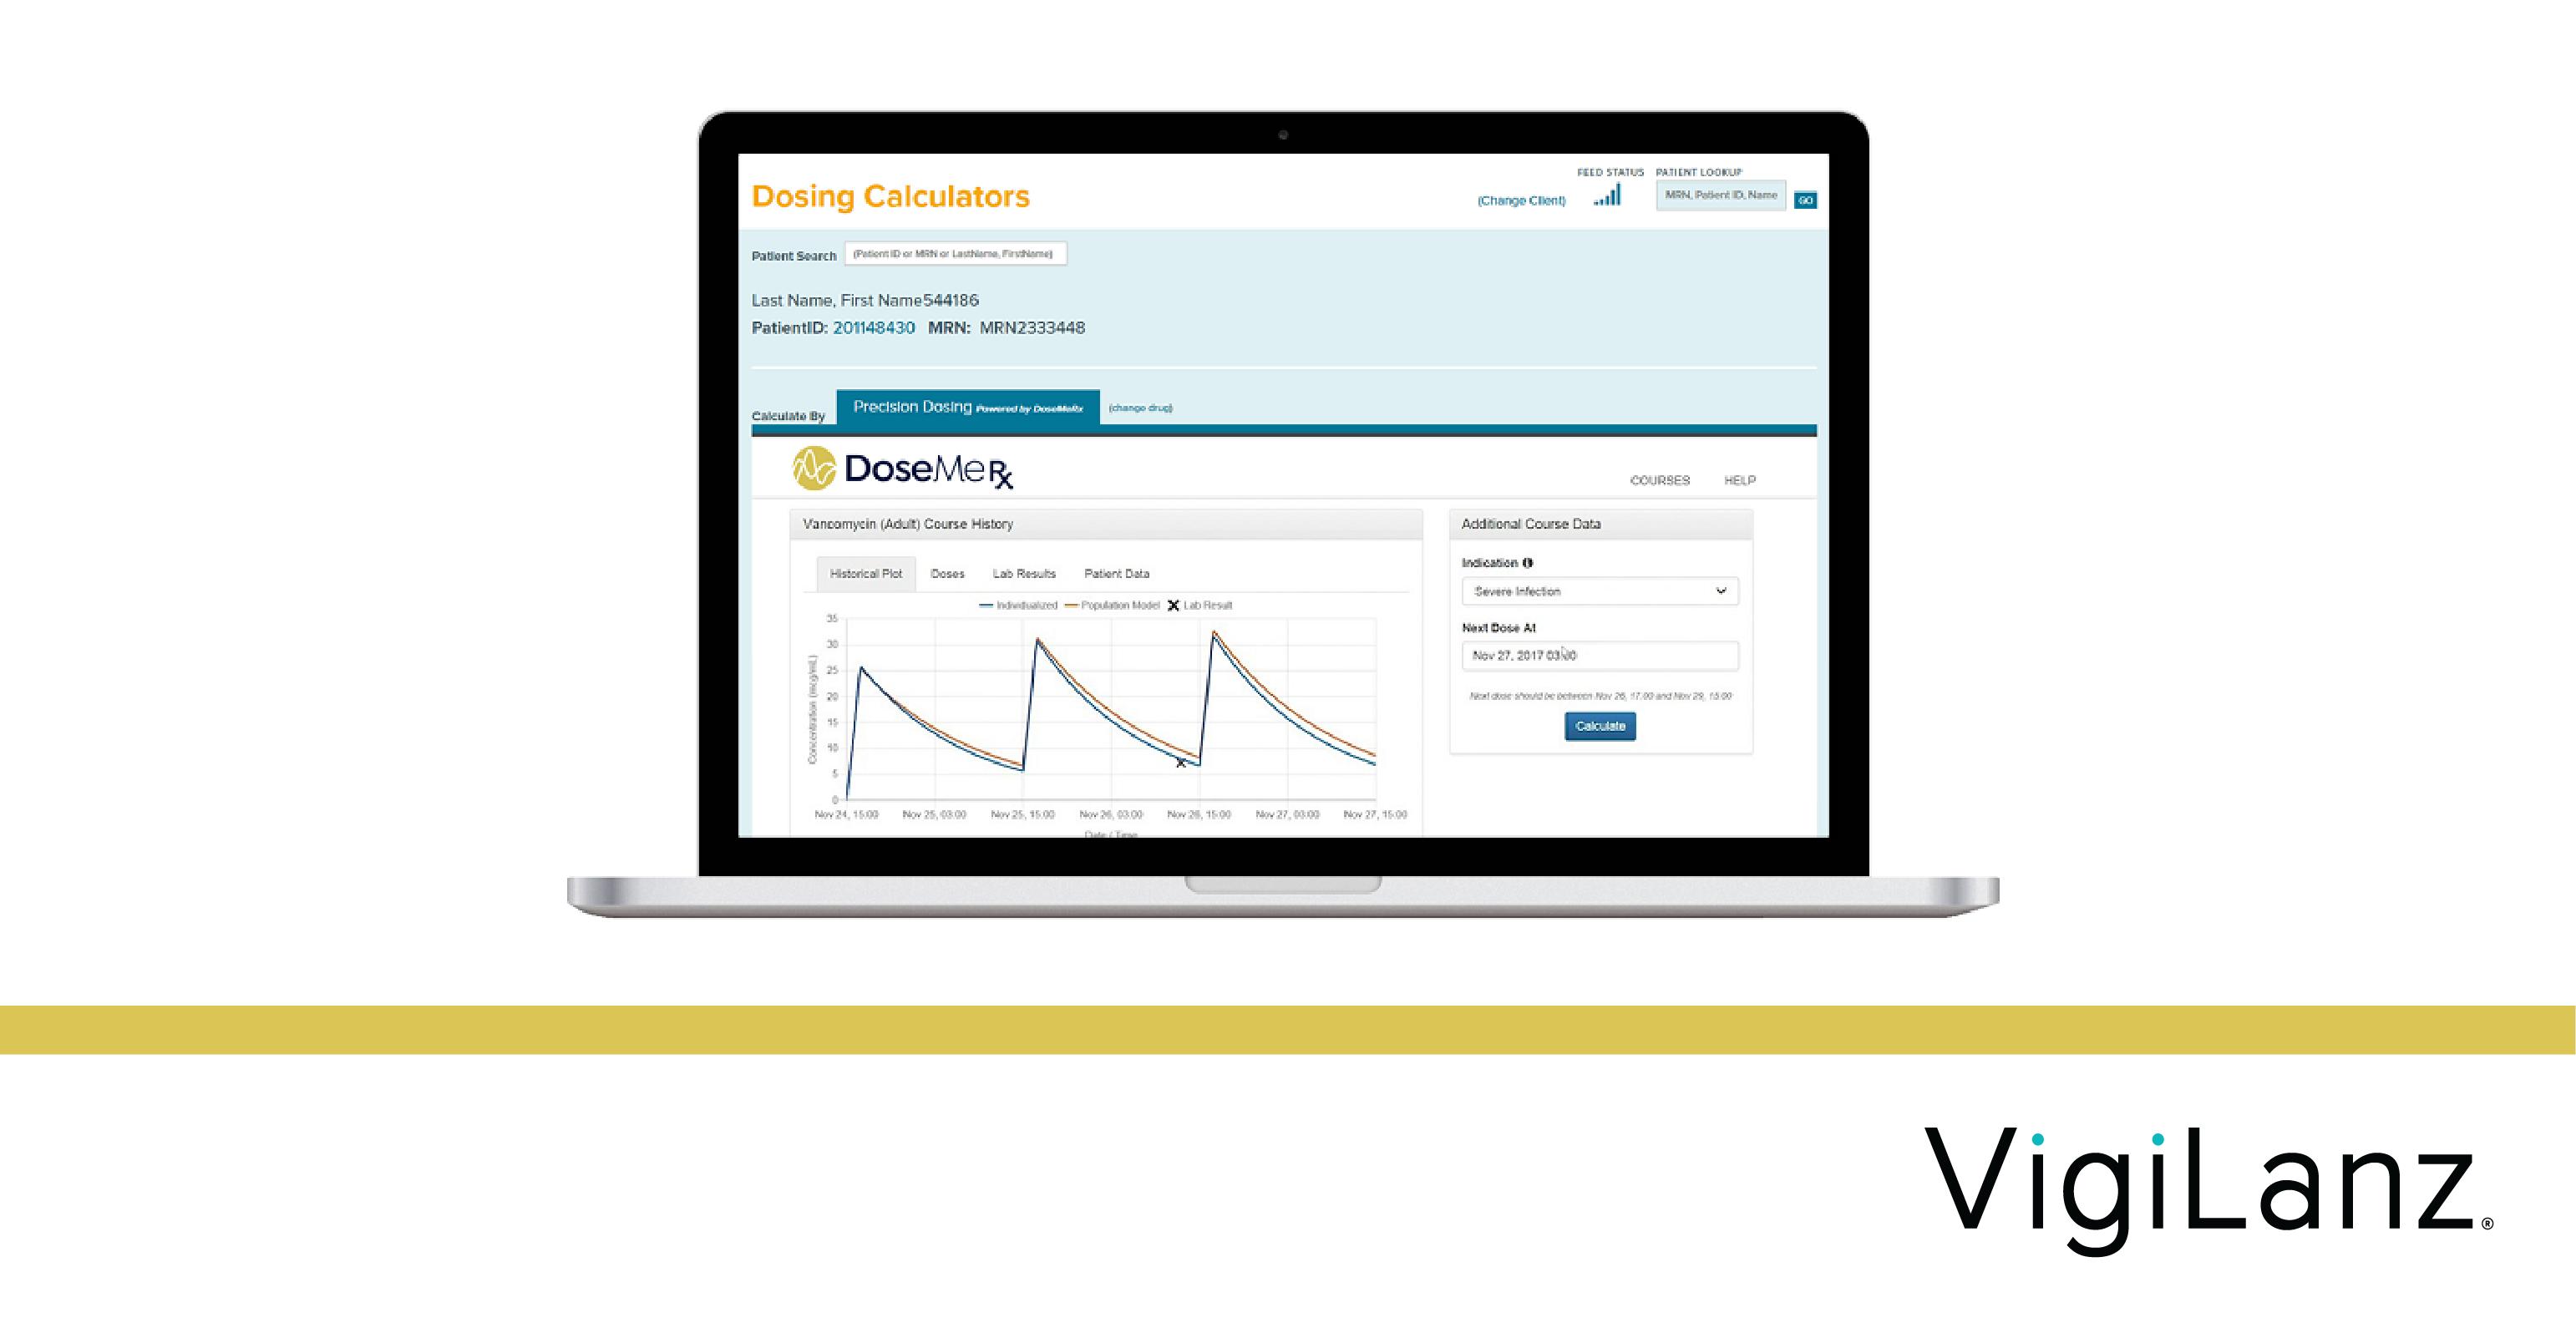 Tabula Rasa Healthcare Announces VigiLanz Precision Dosing Powered by DoseMeRx